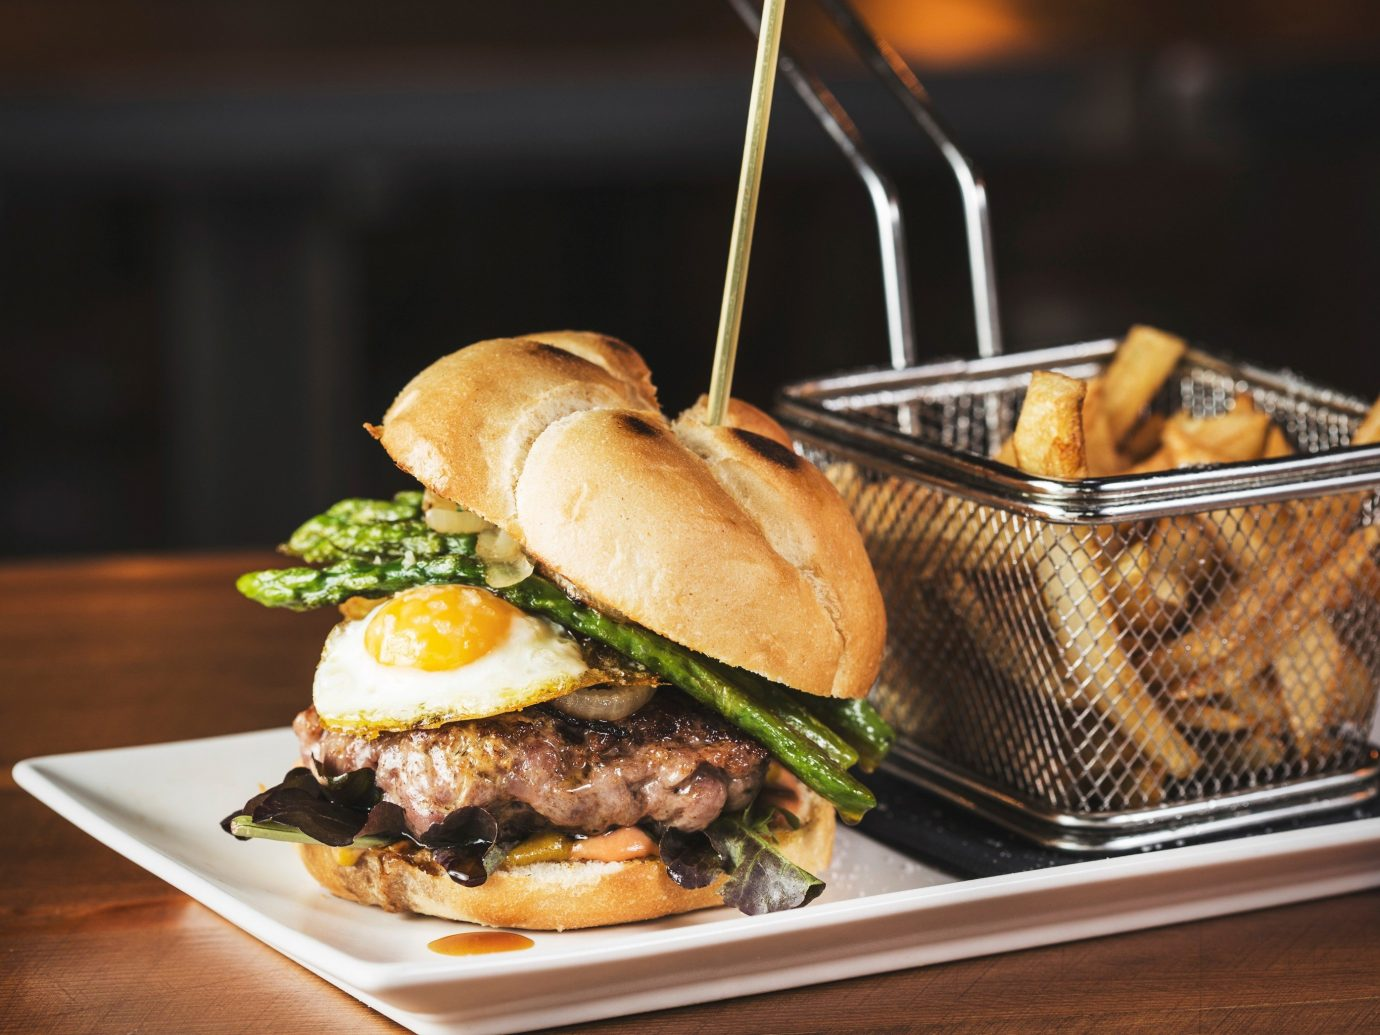 Food + Drink table food dish indoor plate meal snack food restaurant cuisine sense meat hamburger breakfast fast food sandwich